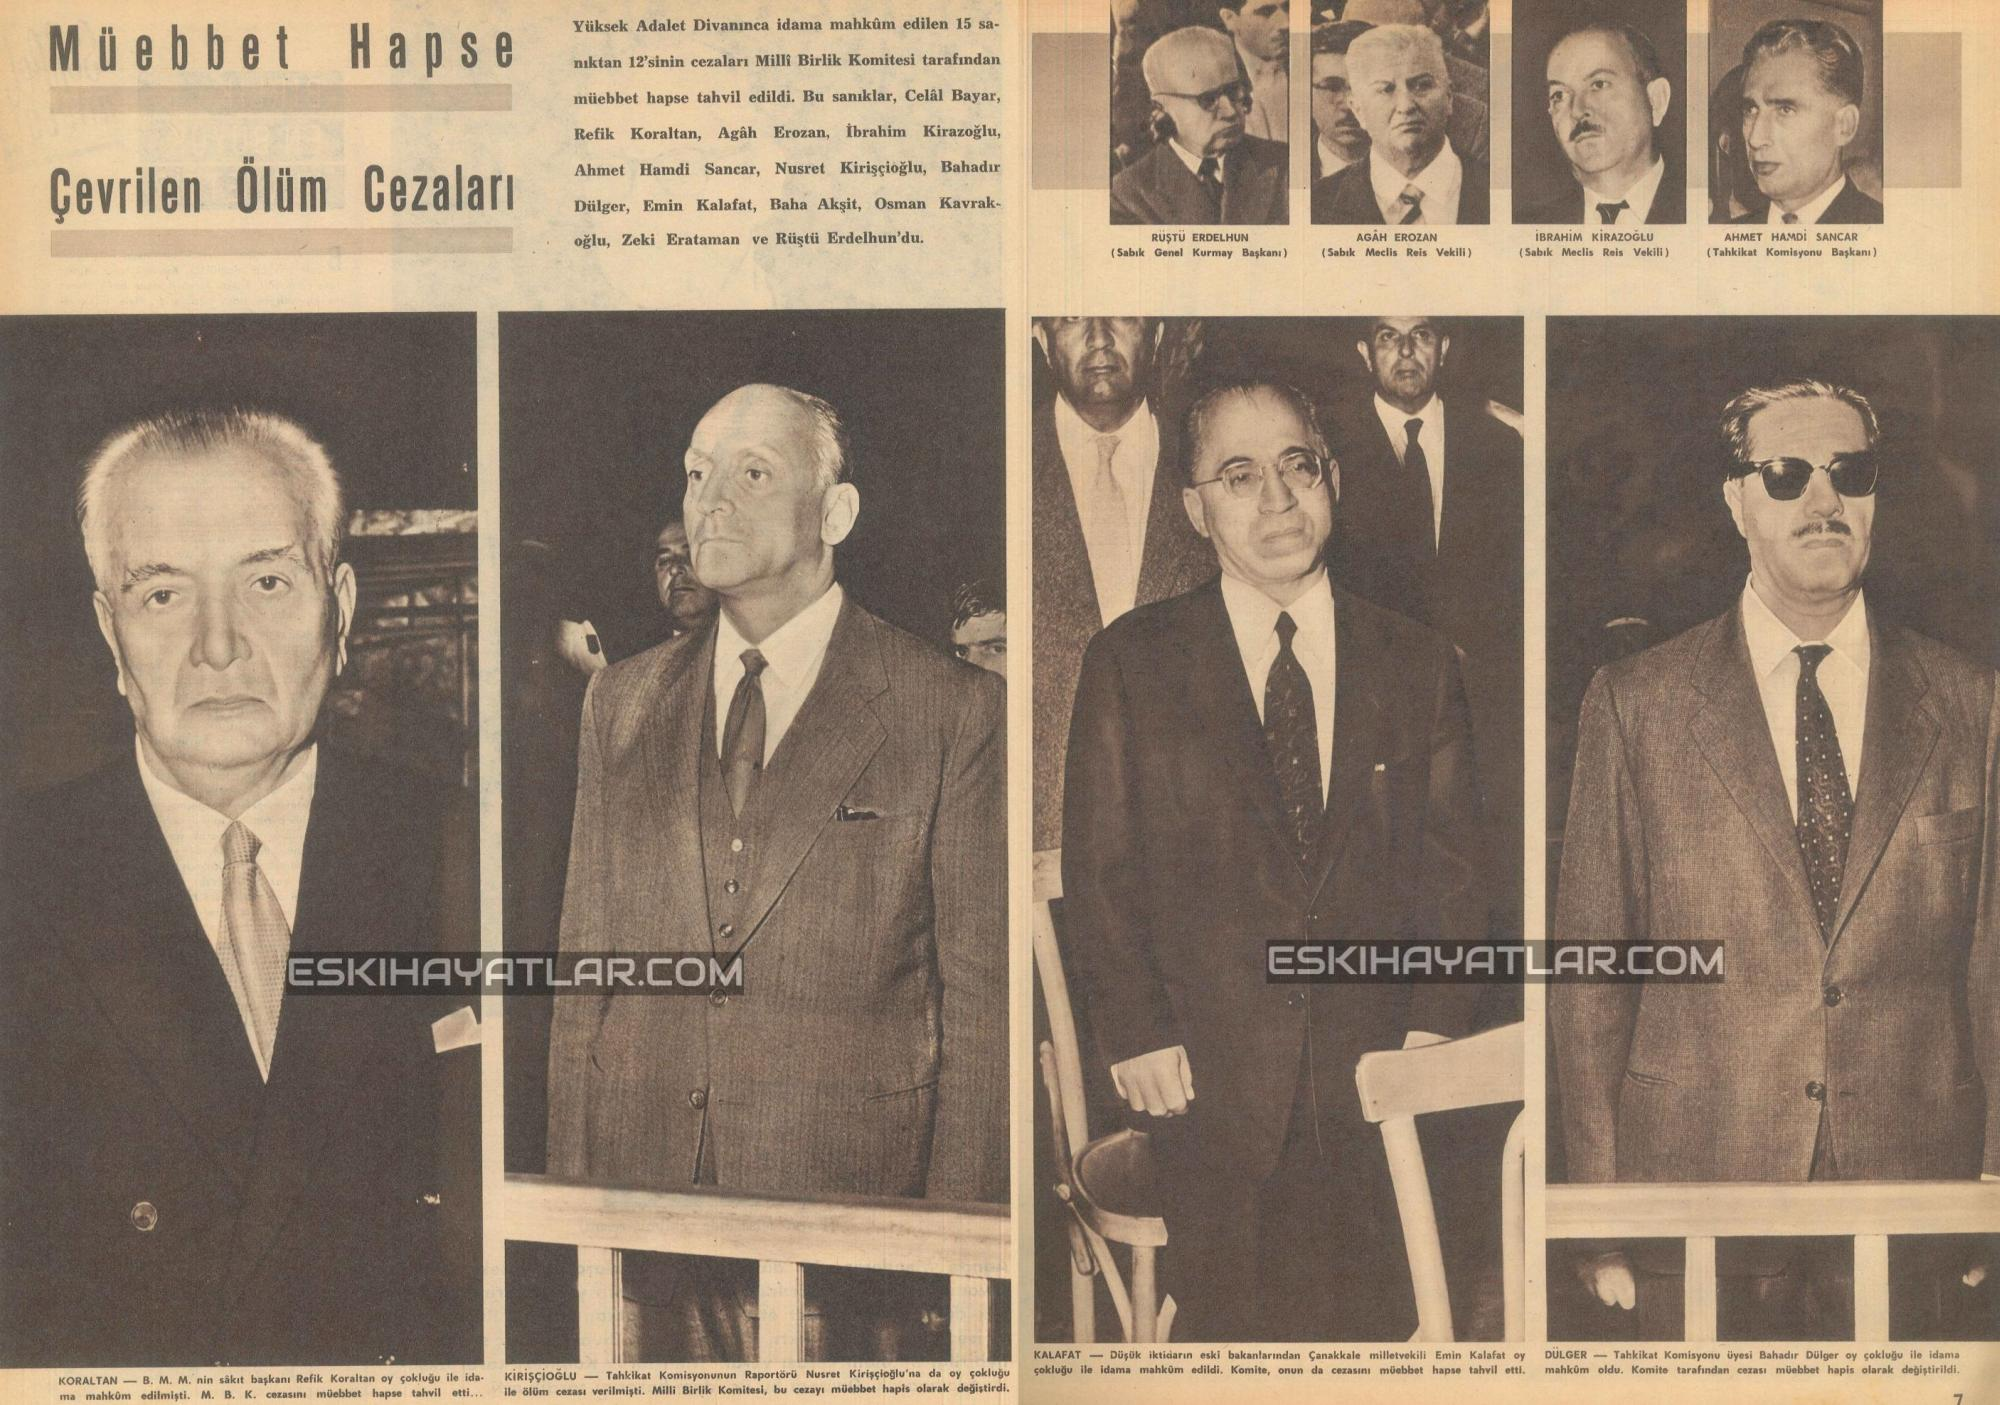 1960-ihtilali-idam-edilenler-adnan-menderes-hasan-polatkan-fatin-rustu-zorlu-yassiada-tutanaklari-1961-hayat-dergisi-arsivleri (6)